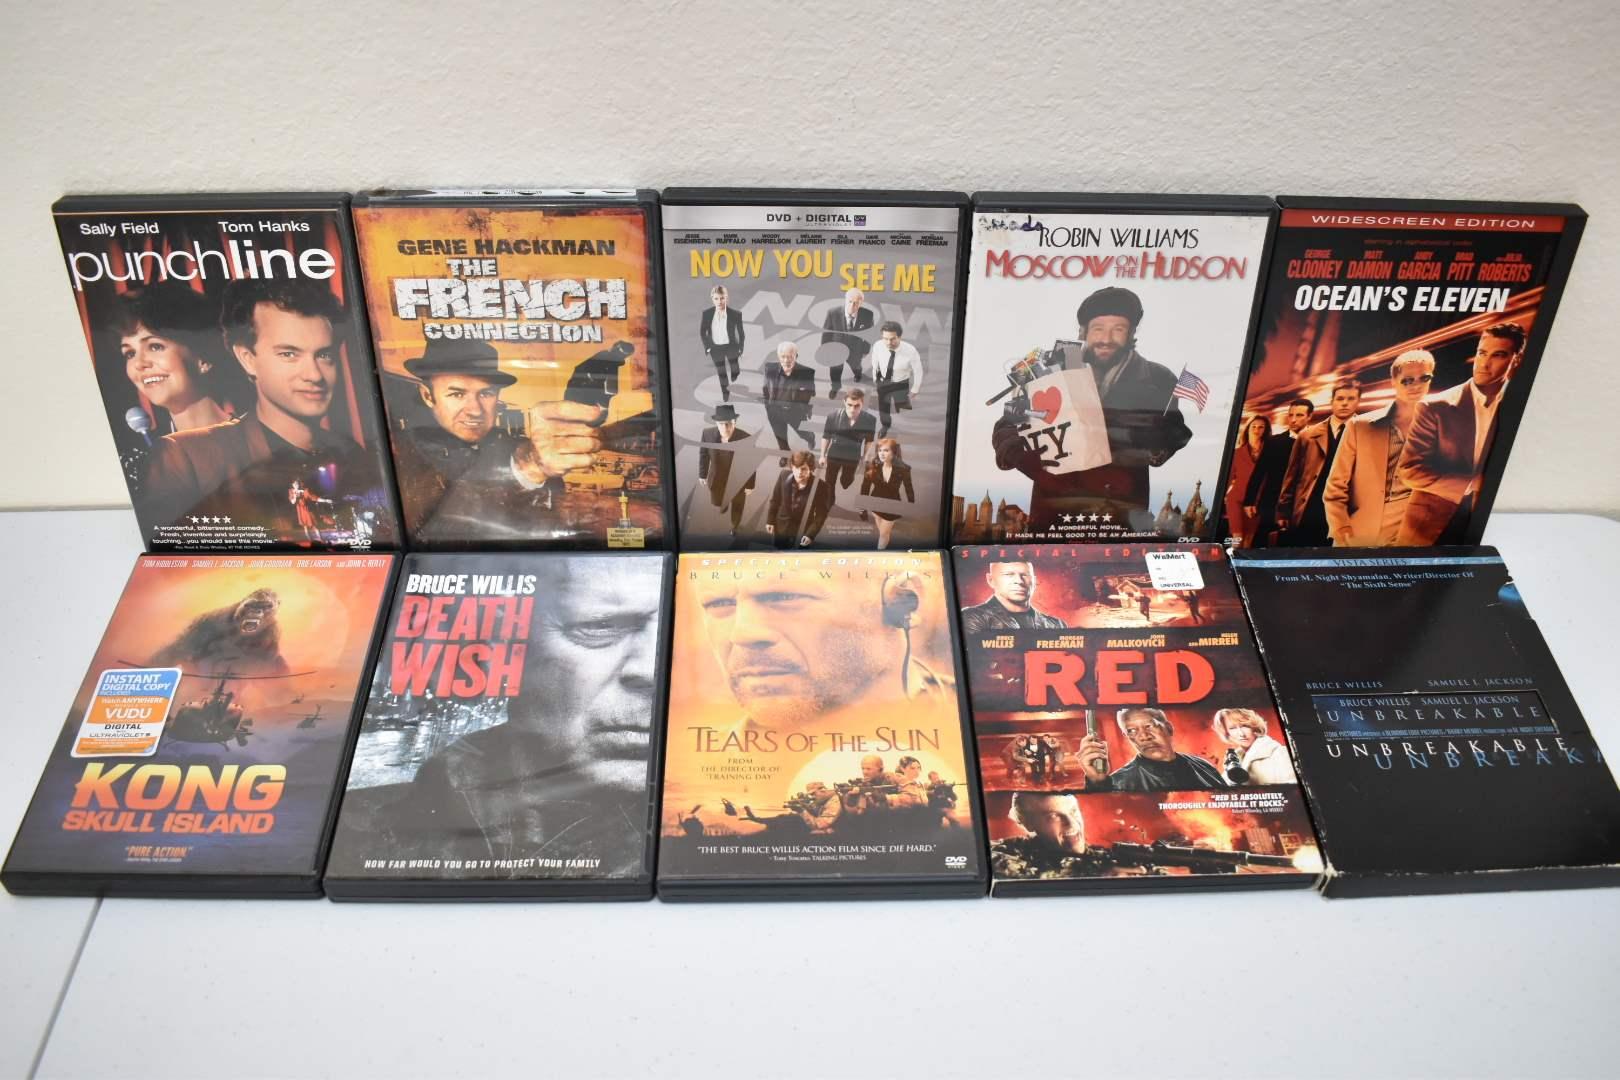 DVDs 9